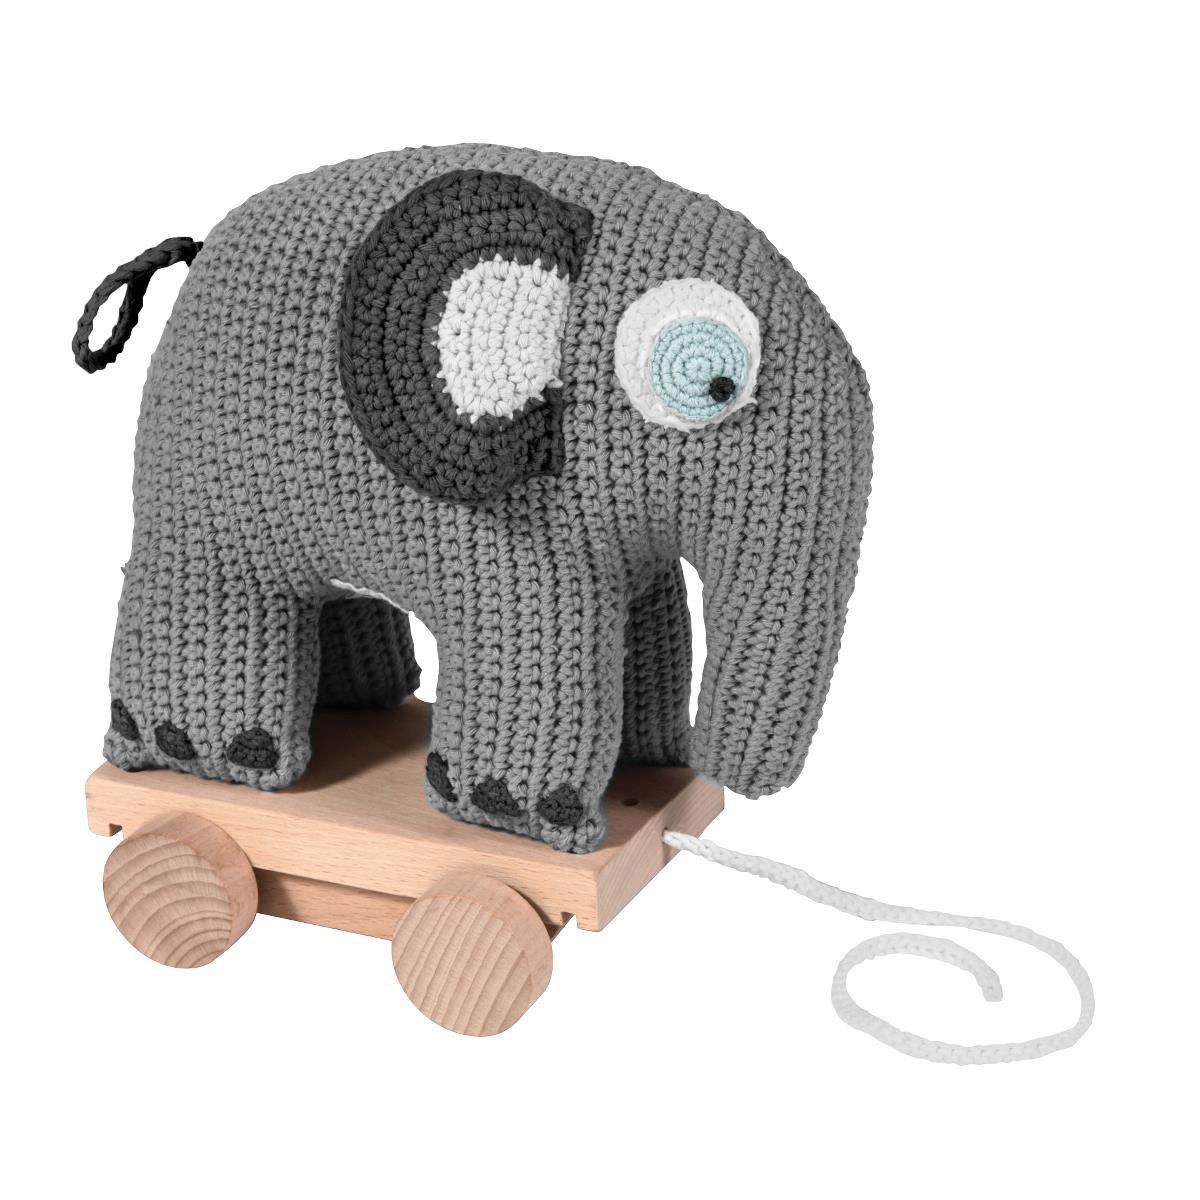 Mes premiers jouets Jouet à Tirer en Crochet - Eléphant Jouet à Tirer en Crochet - Eléphant